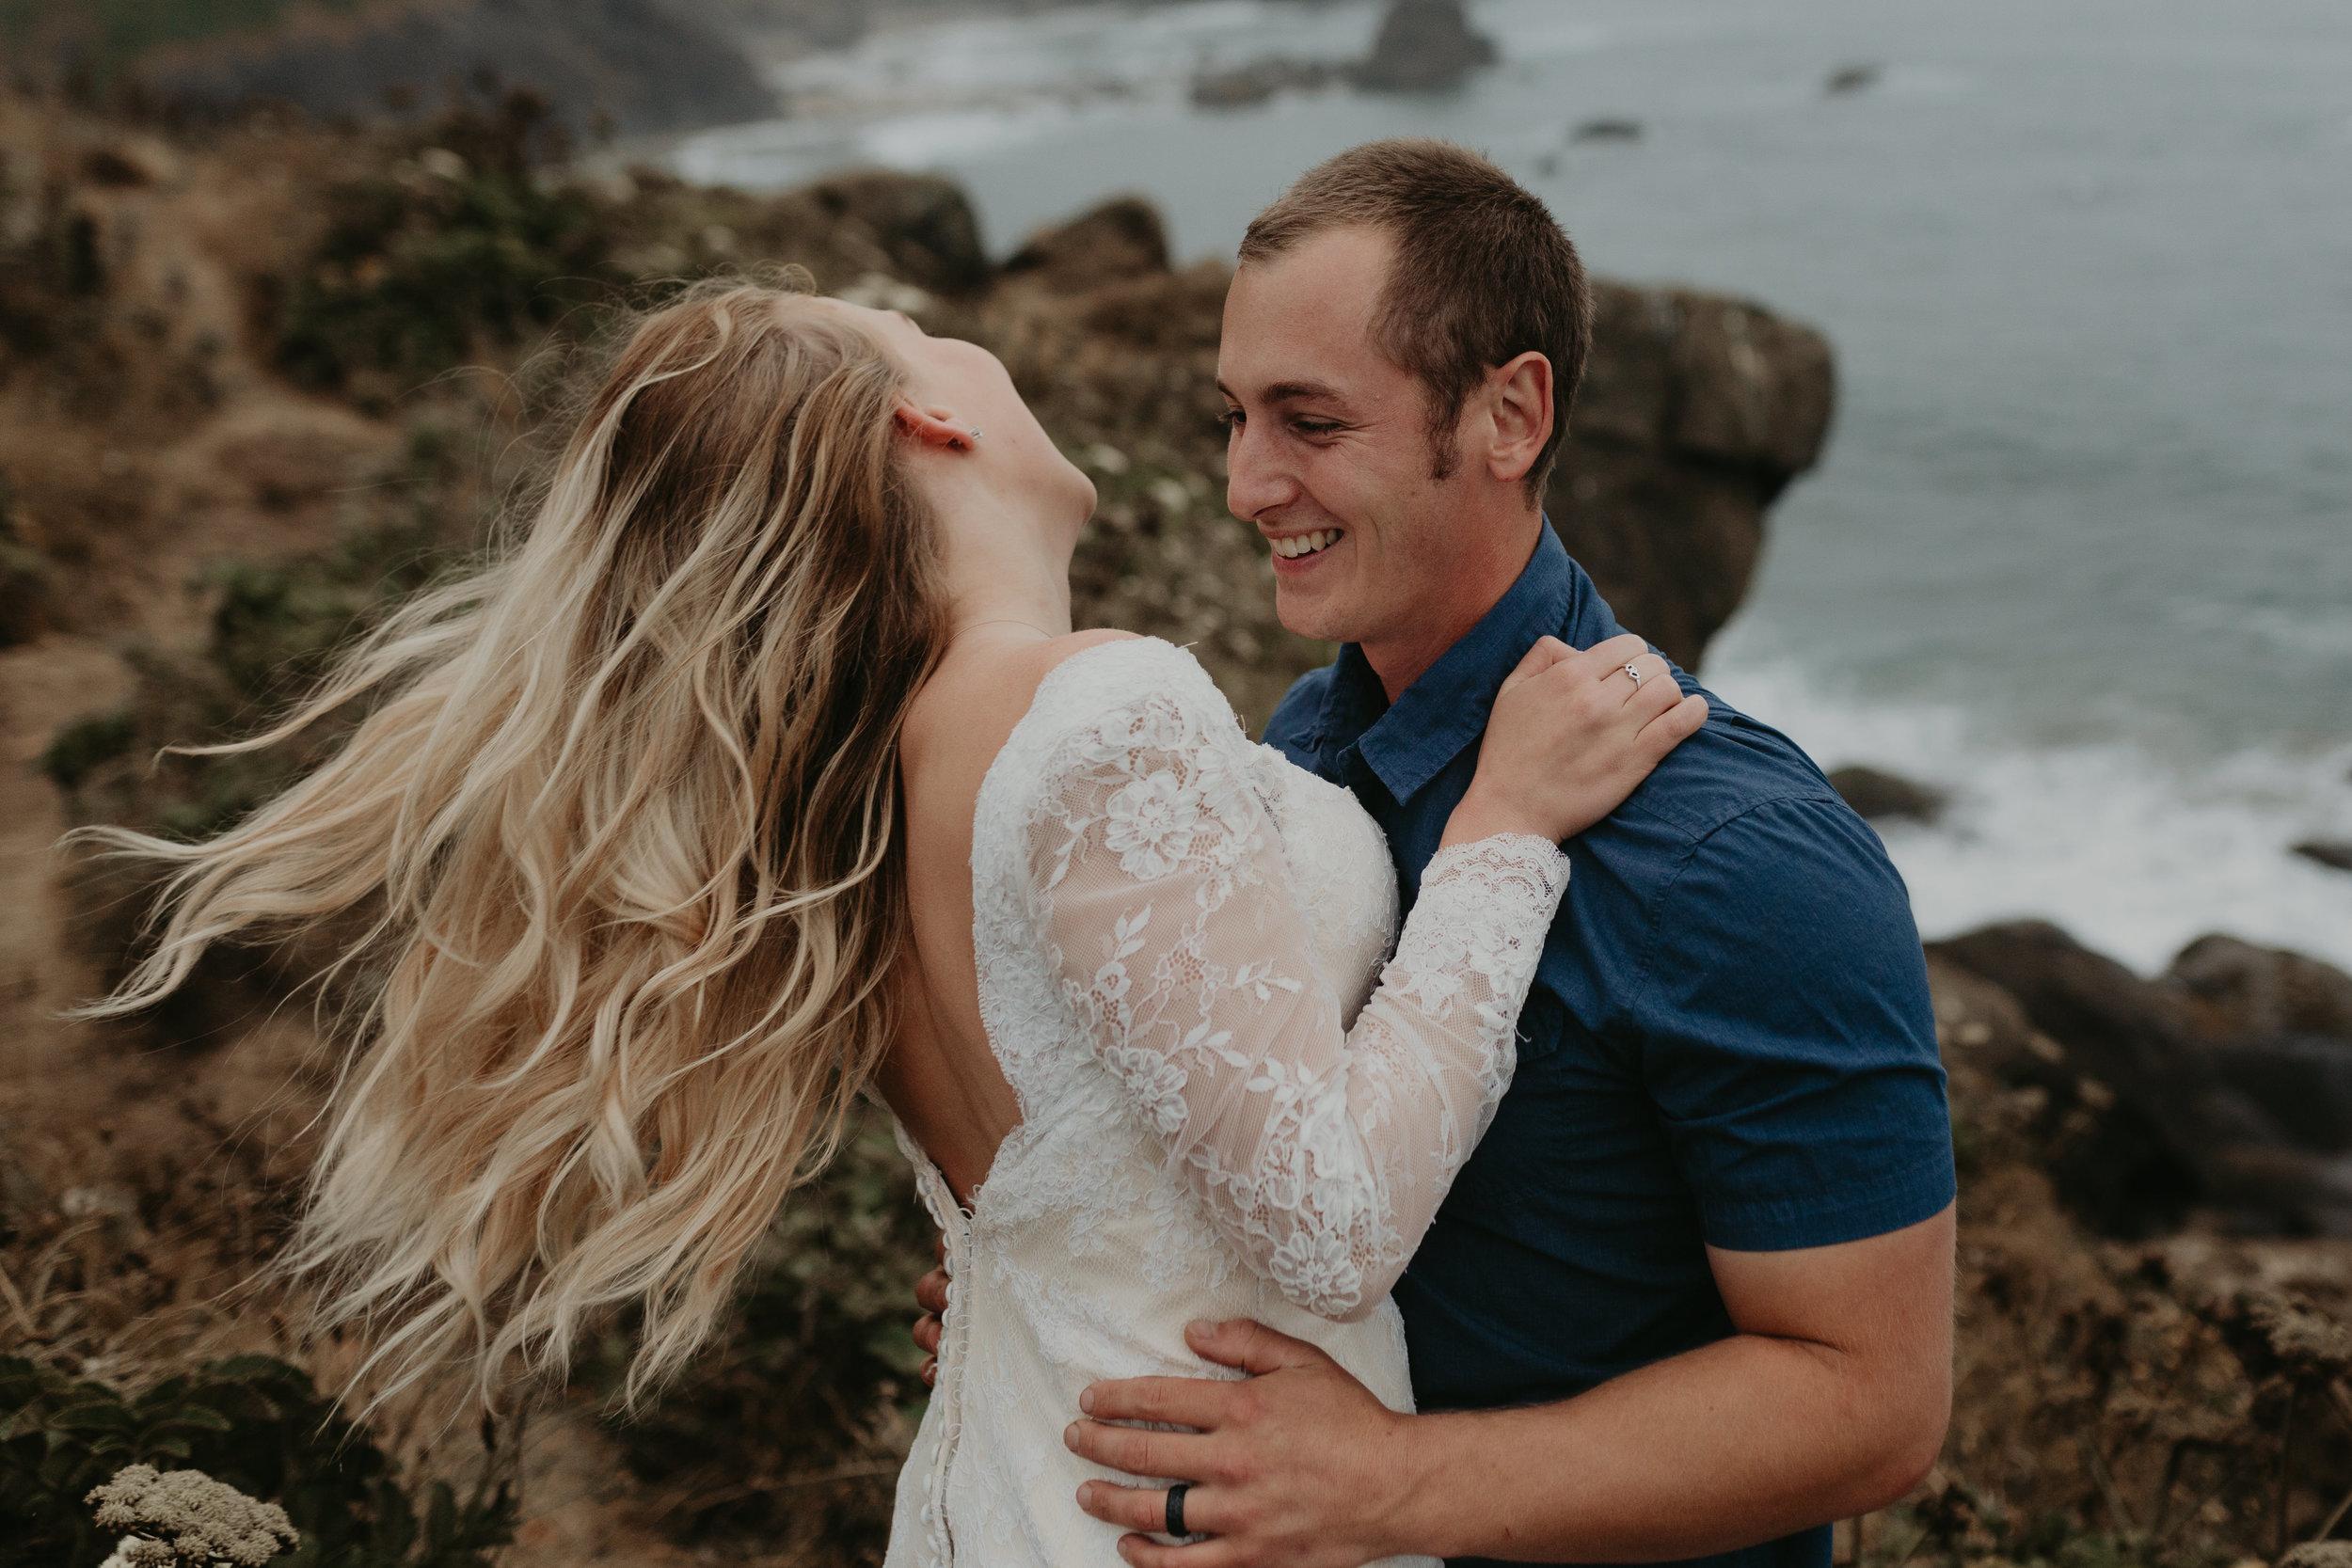 nicole-daacke-photography-ecola-state-park-oregon-elopement-bridal-photos-photographer-for-cannon-beach-elopement-oregon-coast-elopement-photographer-foggy-summer-elopement-cannon-beach-best-adventure-elopement-photographer-7013.jpg